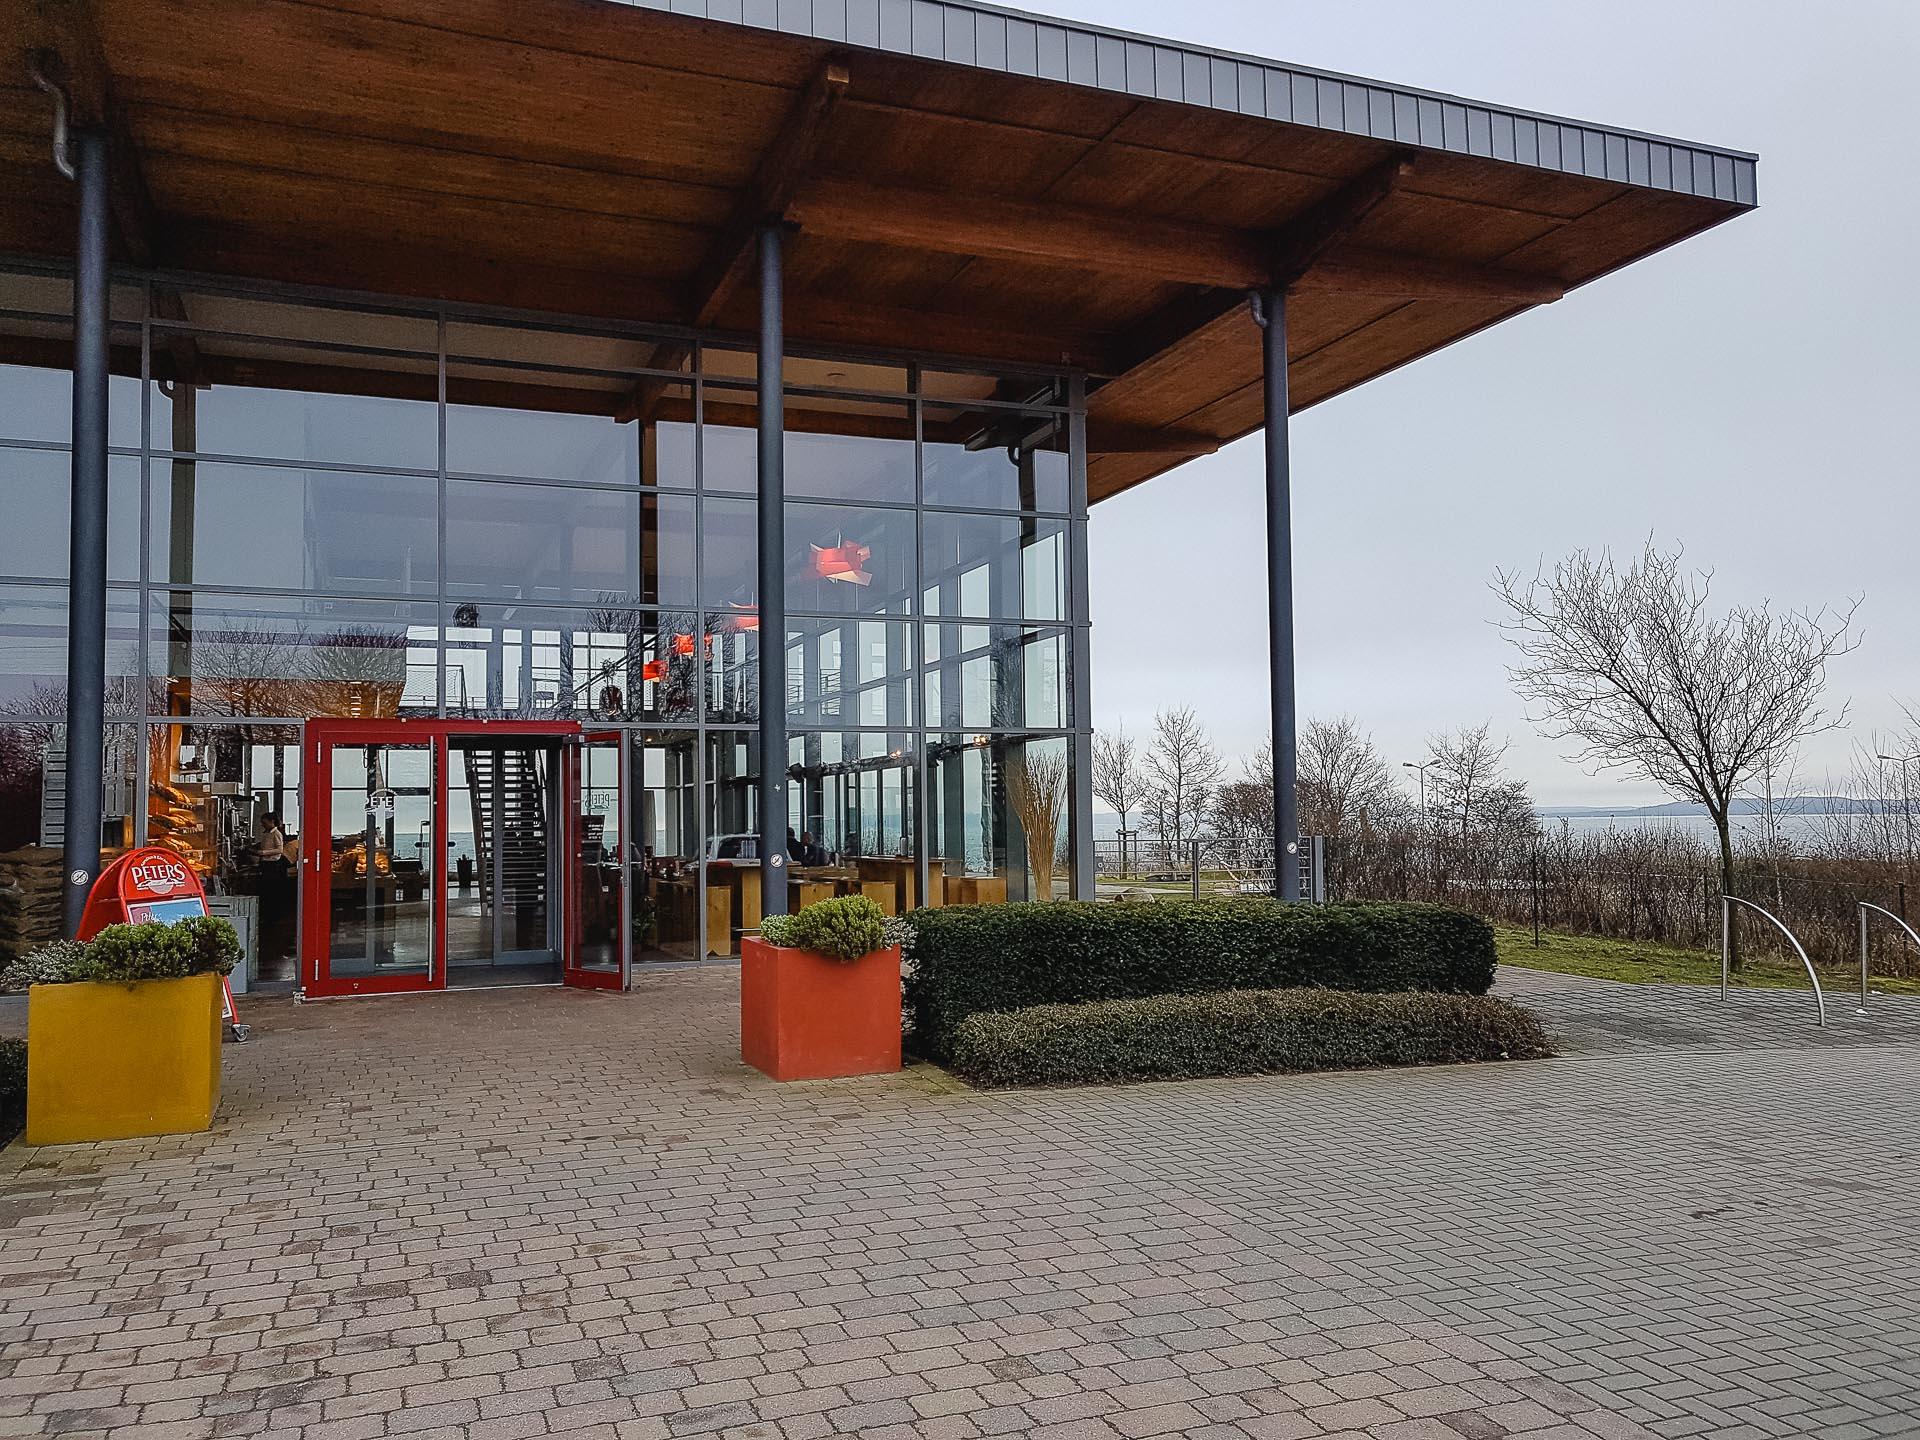 Café & Bäckerei Peters Fährhafen Mukran